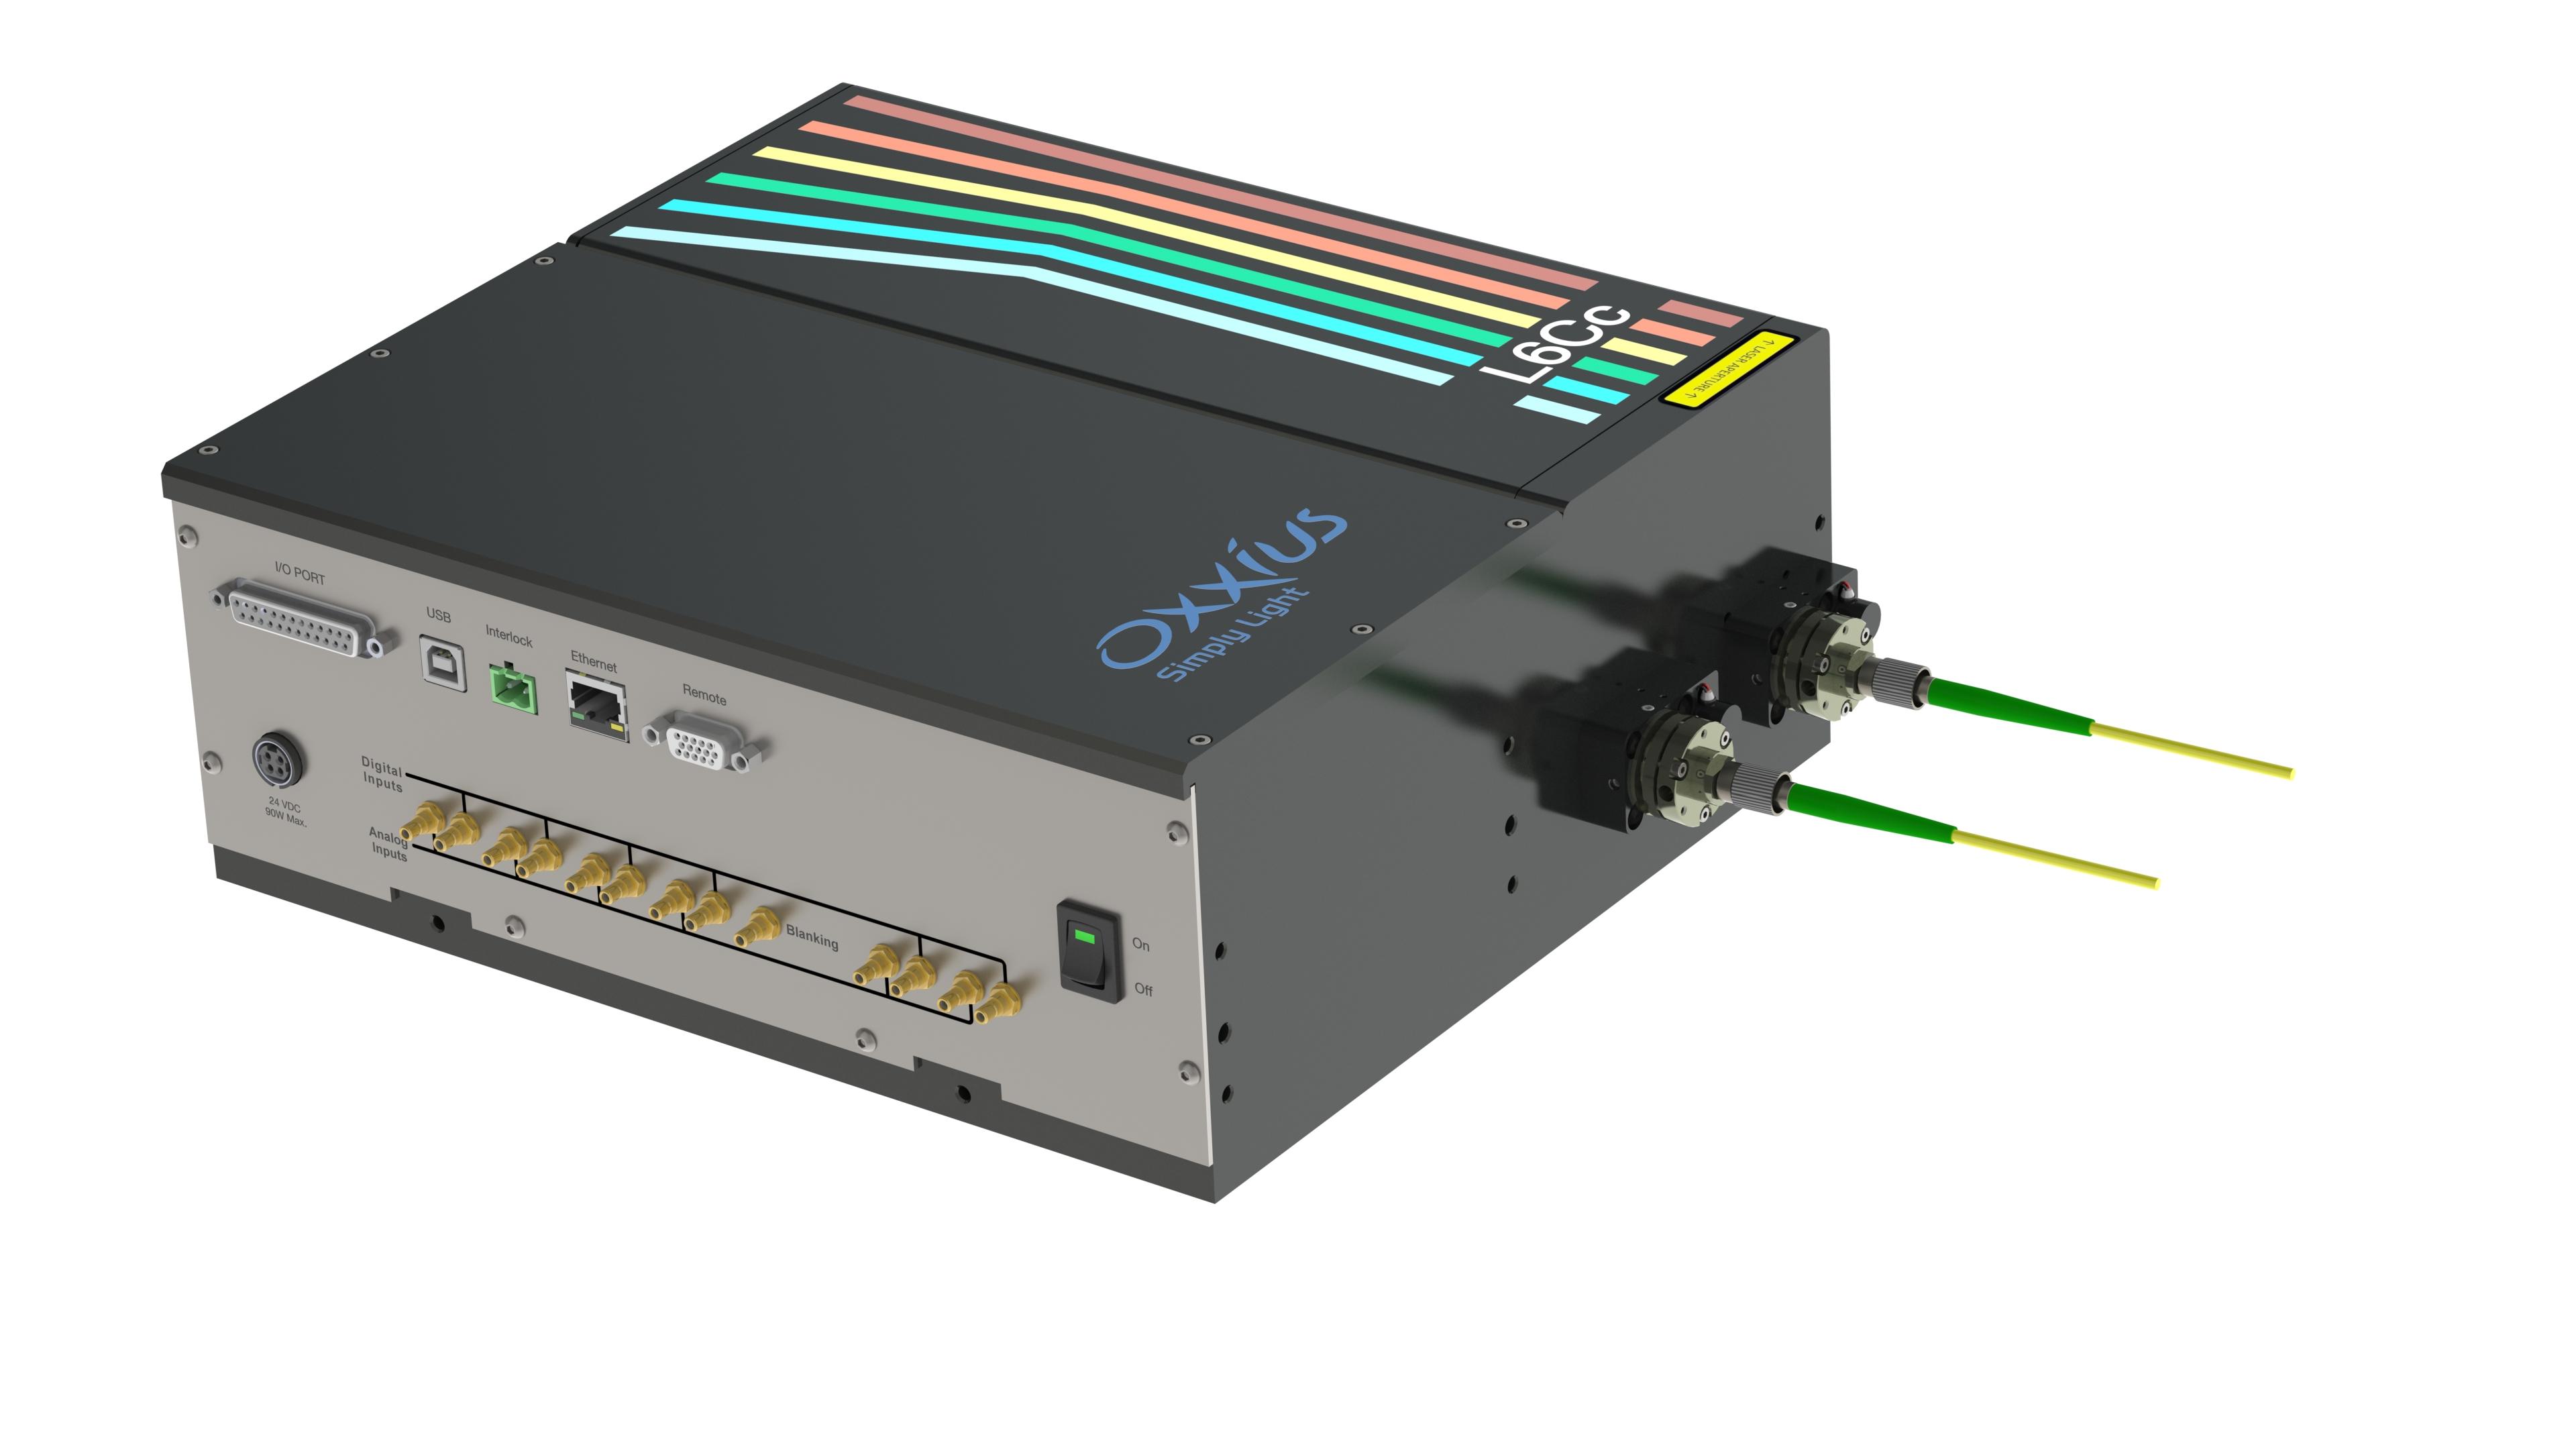 OD0090E600-3 L6Cc DEM939 FT3D ACX-FCPM-RGVB x2 3840PV2 111217